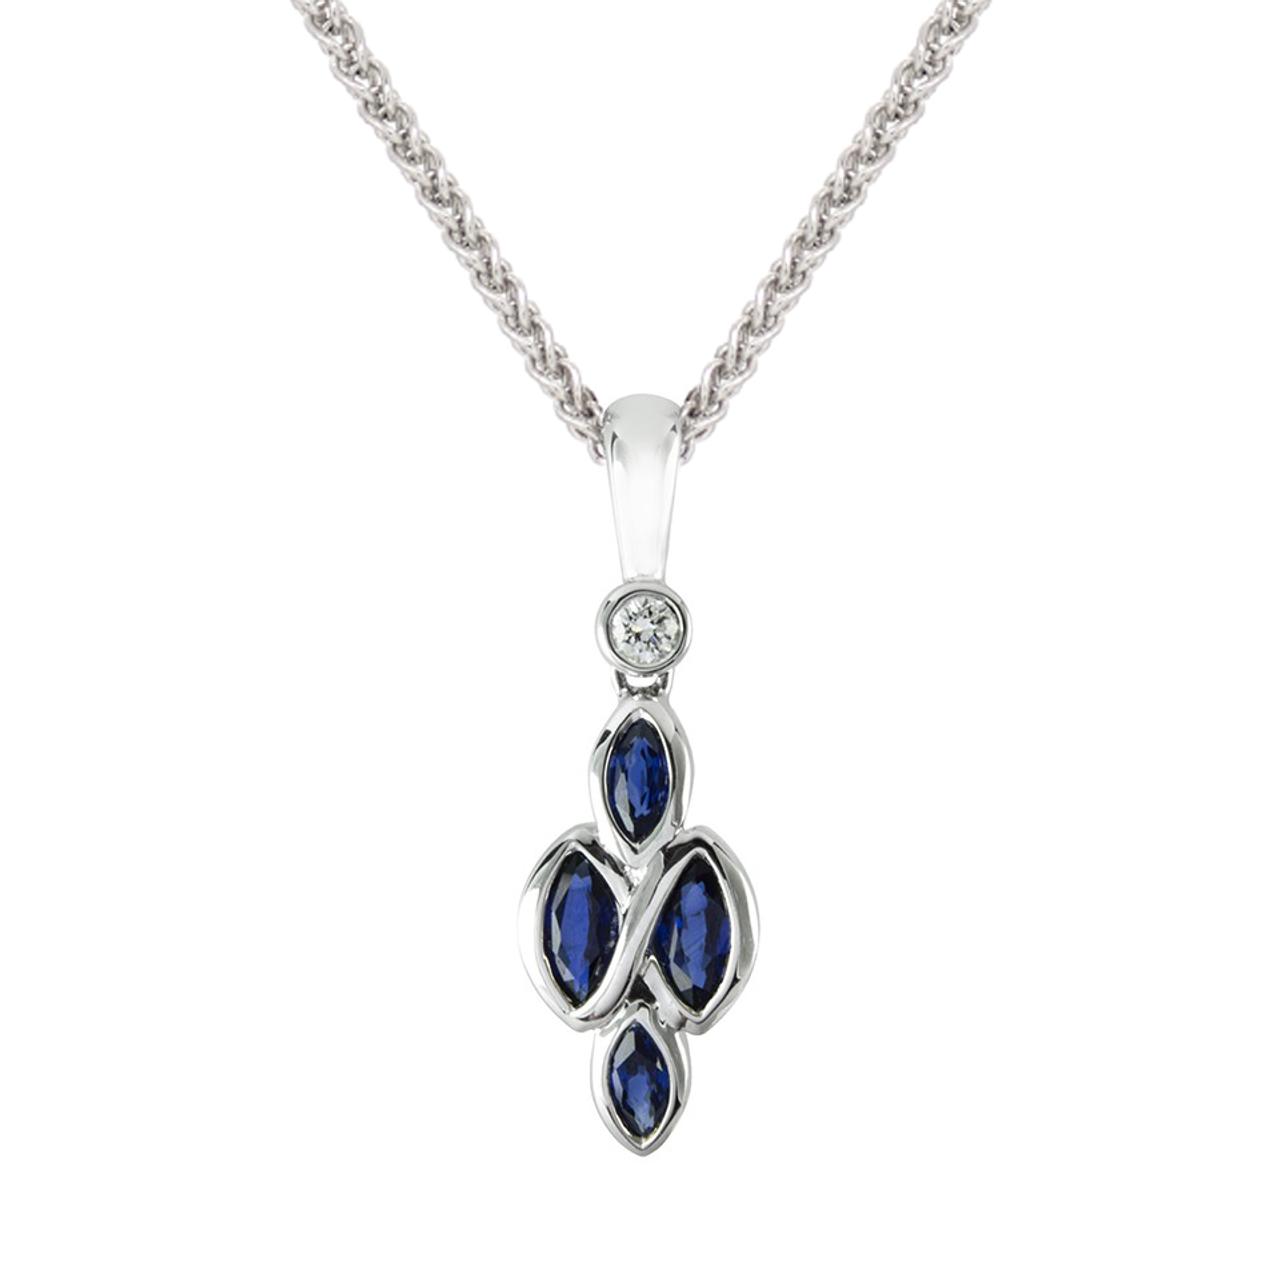 18ct White Gold Sapphire & Diamond Eternal Pendant & Chain